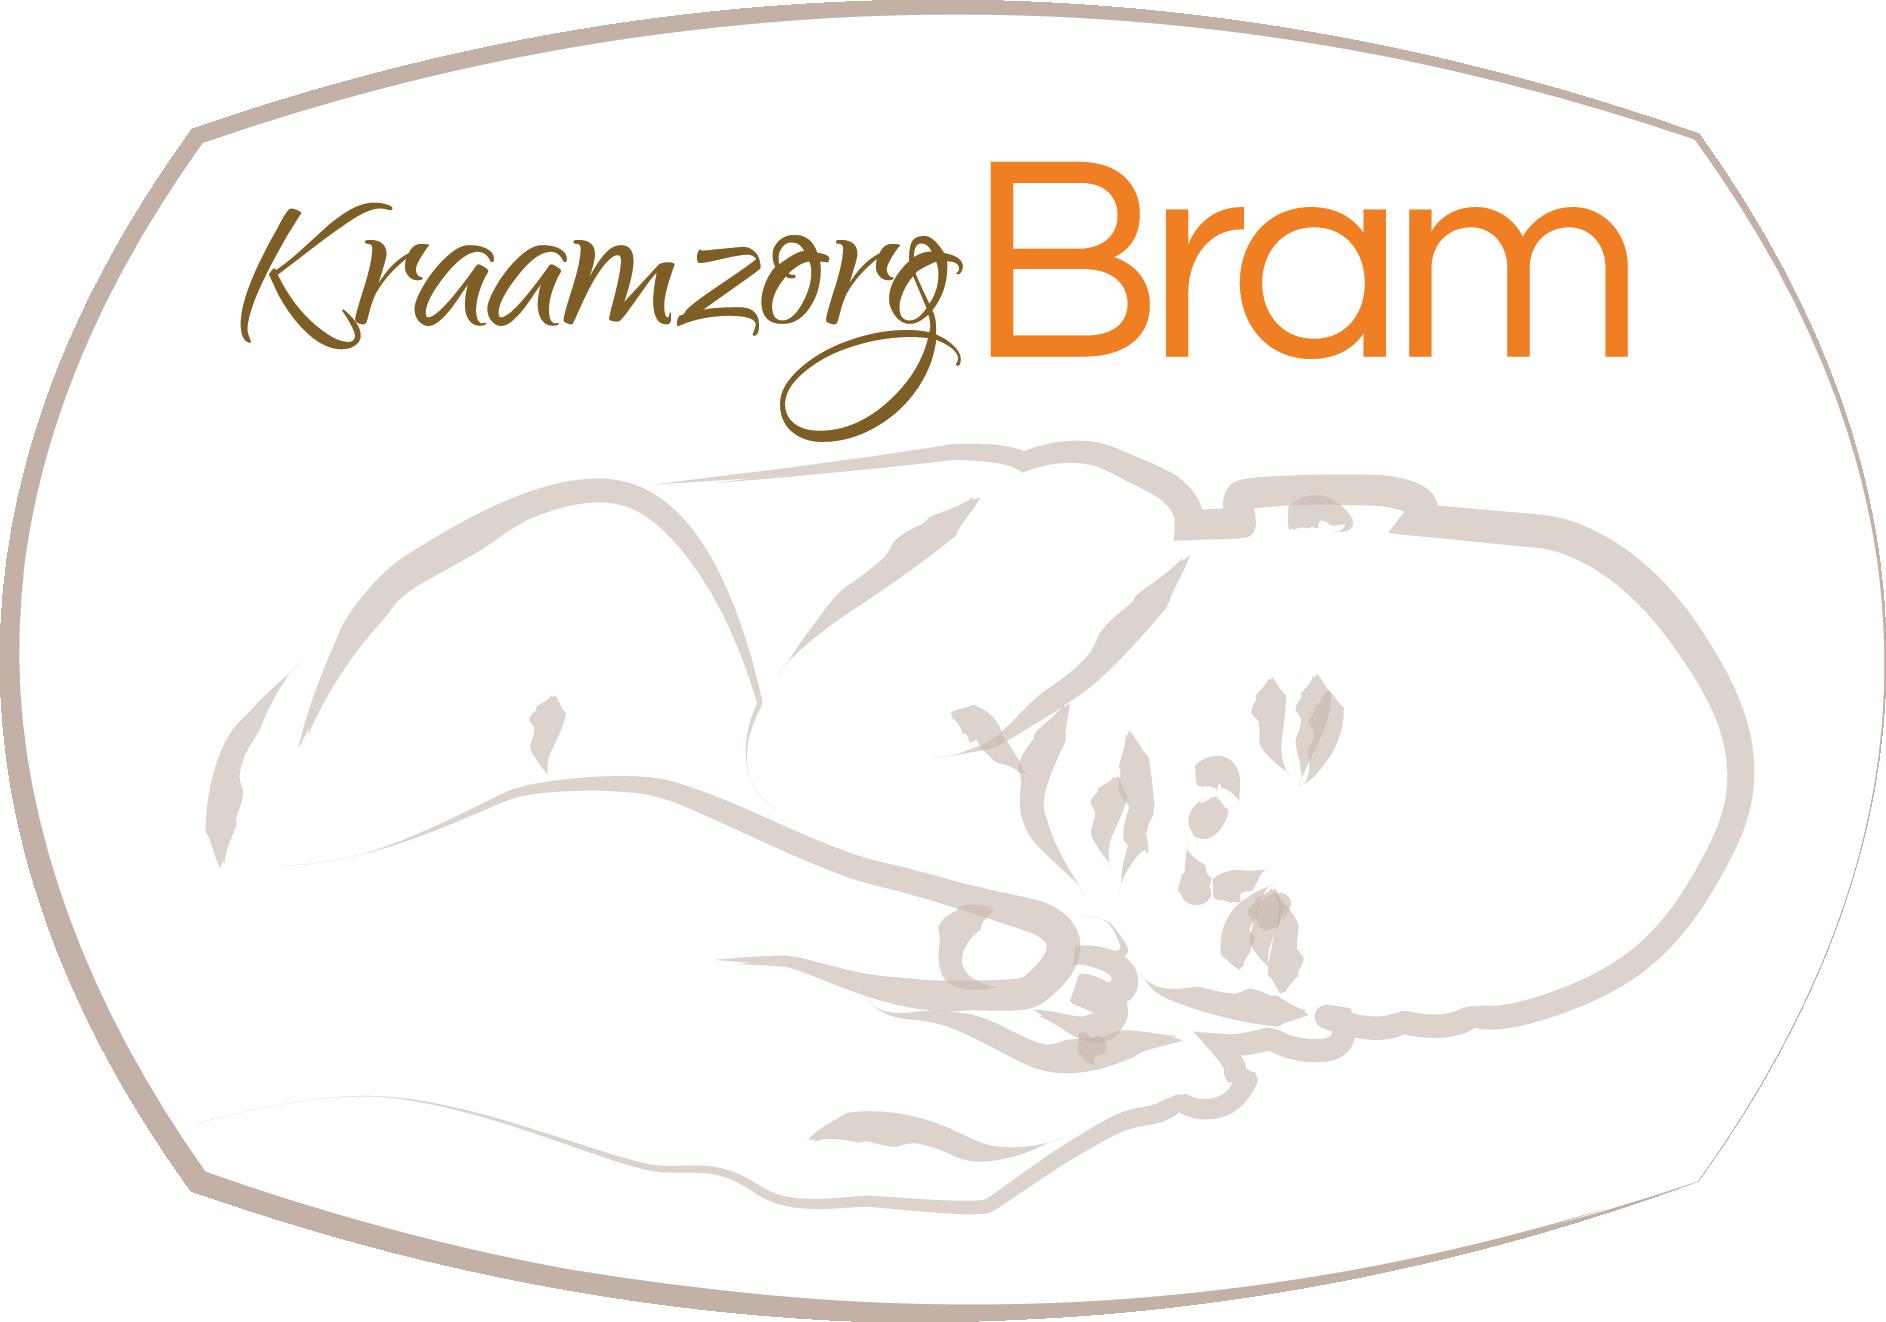 Logo-KraamzorgBram-middel-1.png